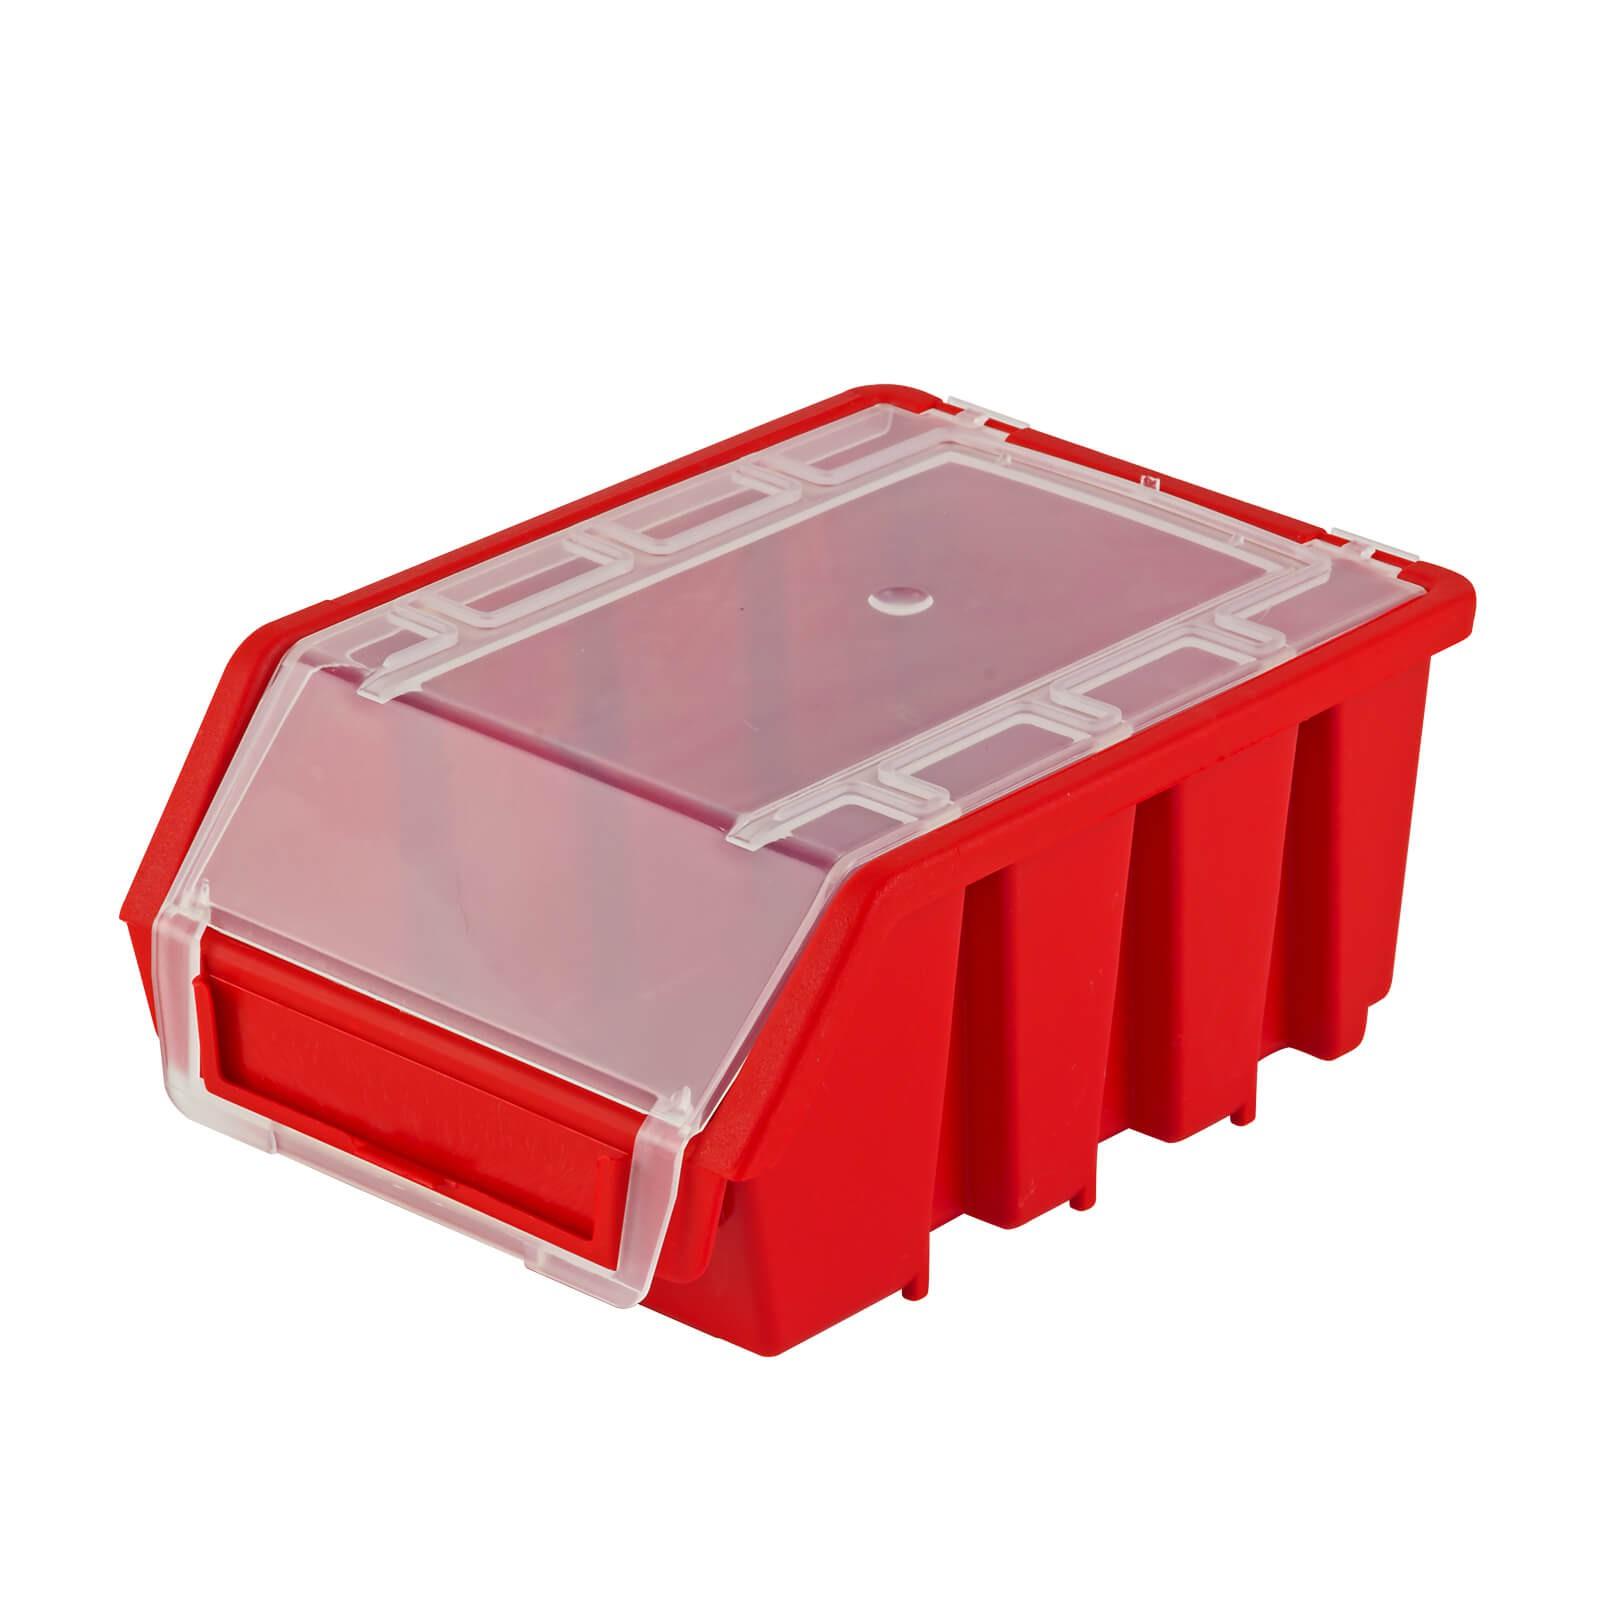 adb stapelbox ergobox gr 2 mit deckel. Black Bedroom Furniture Sets. Home Design Ideas